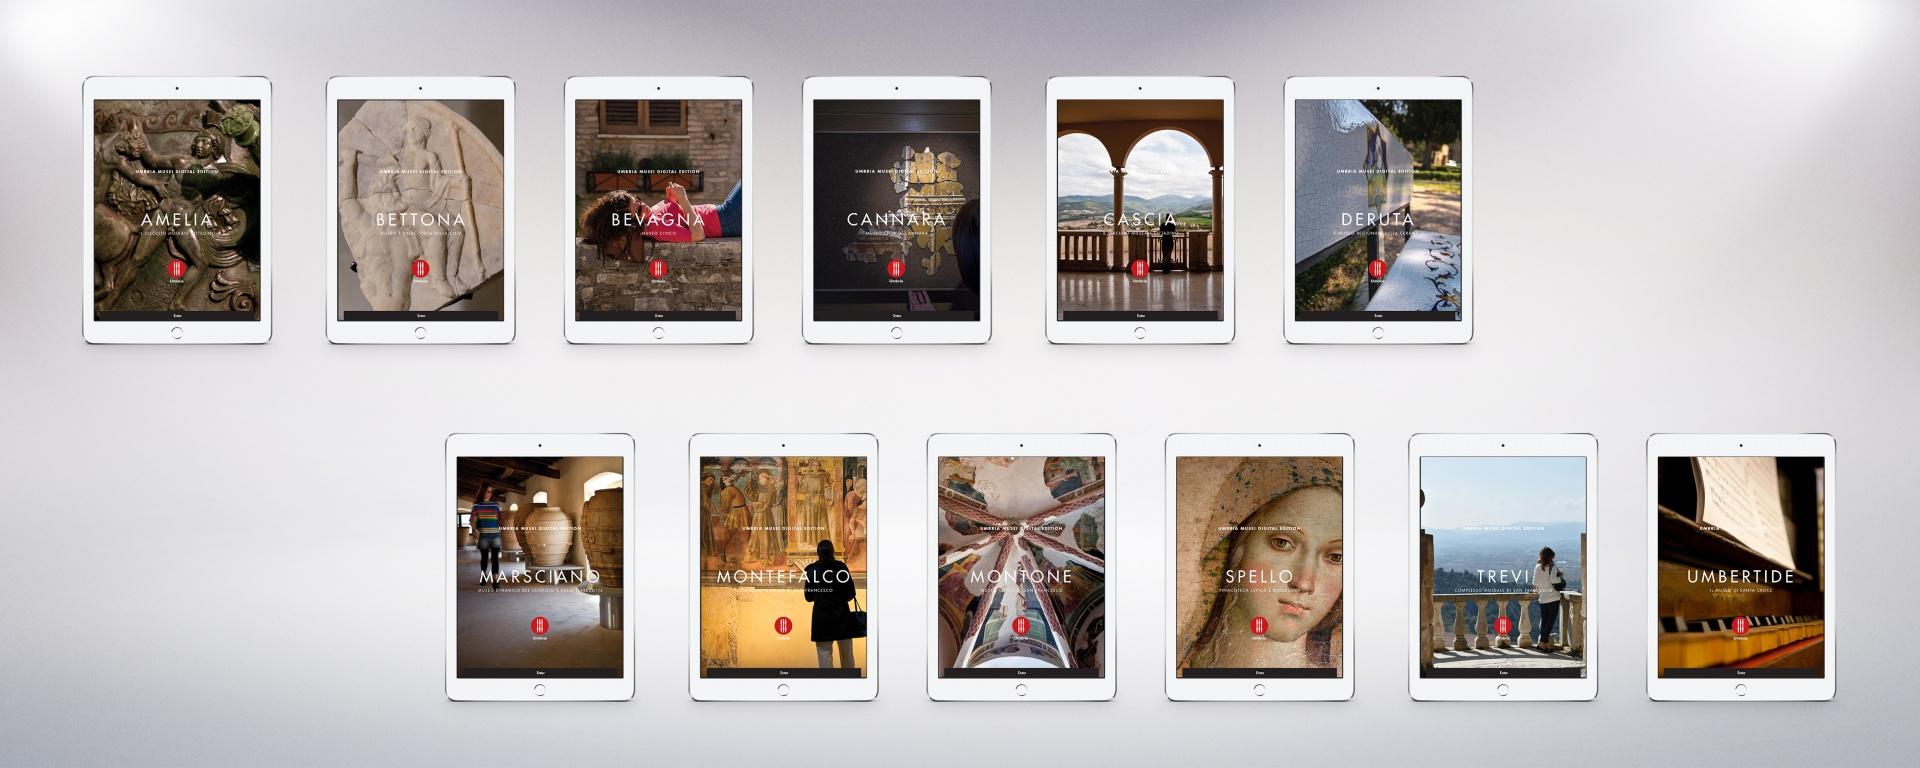 Guida Turistica Musei App | Regione Umbria